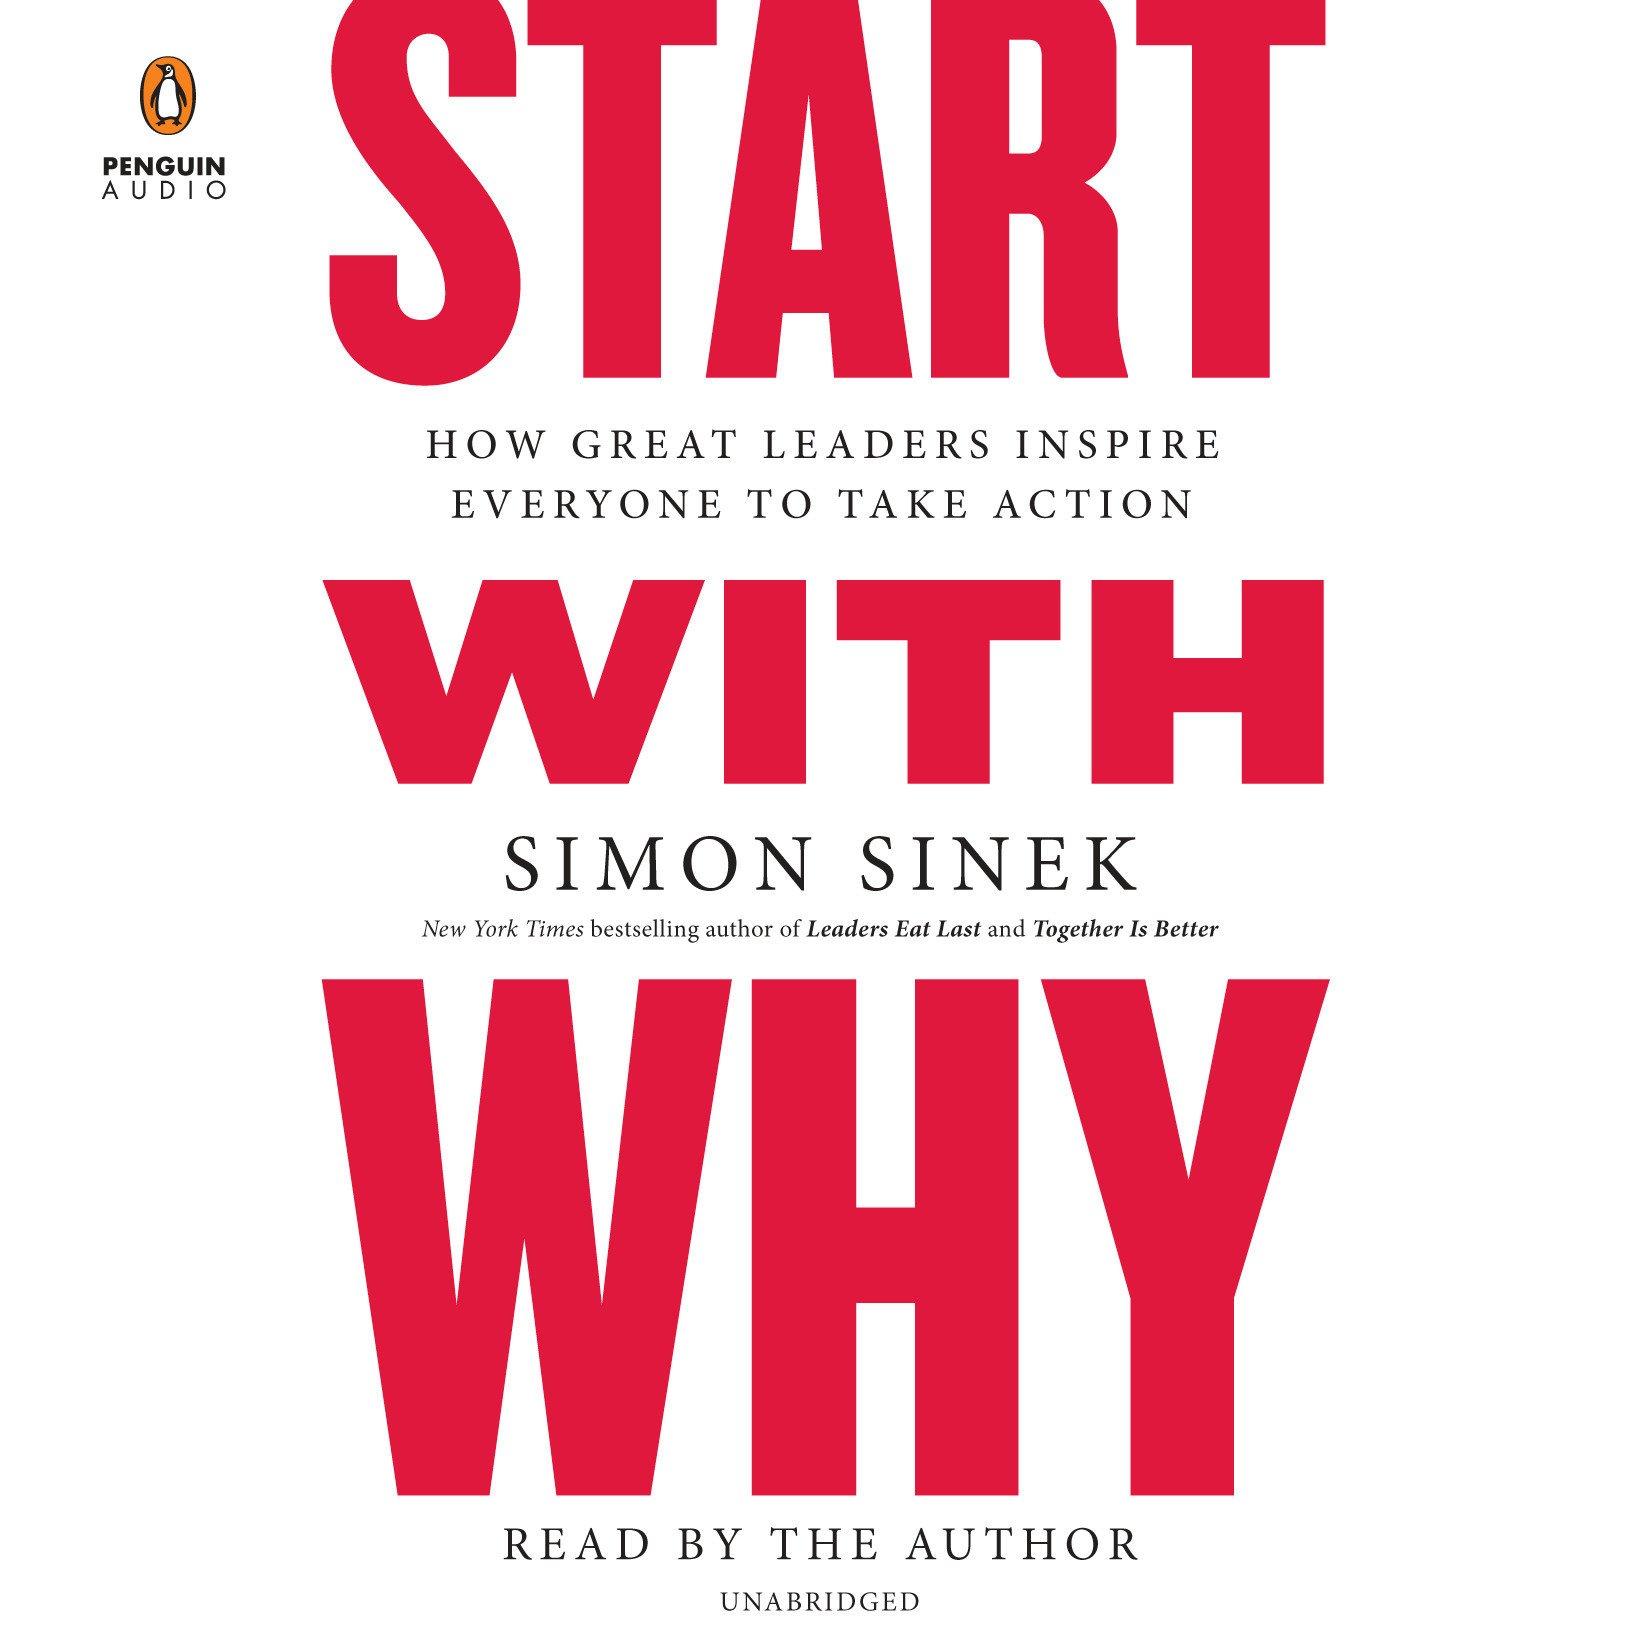 It starts with why simon sinek